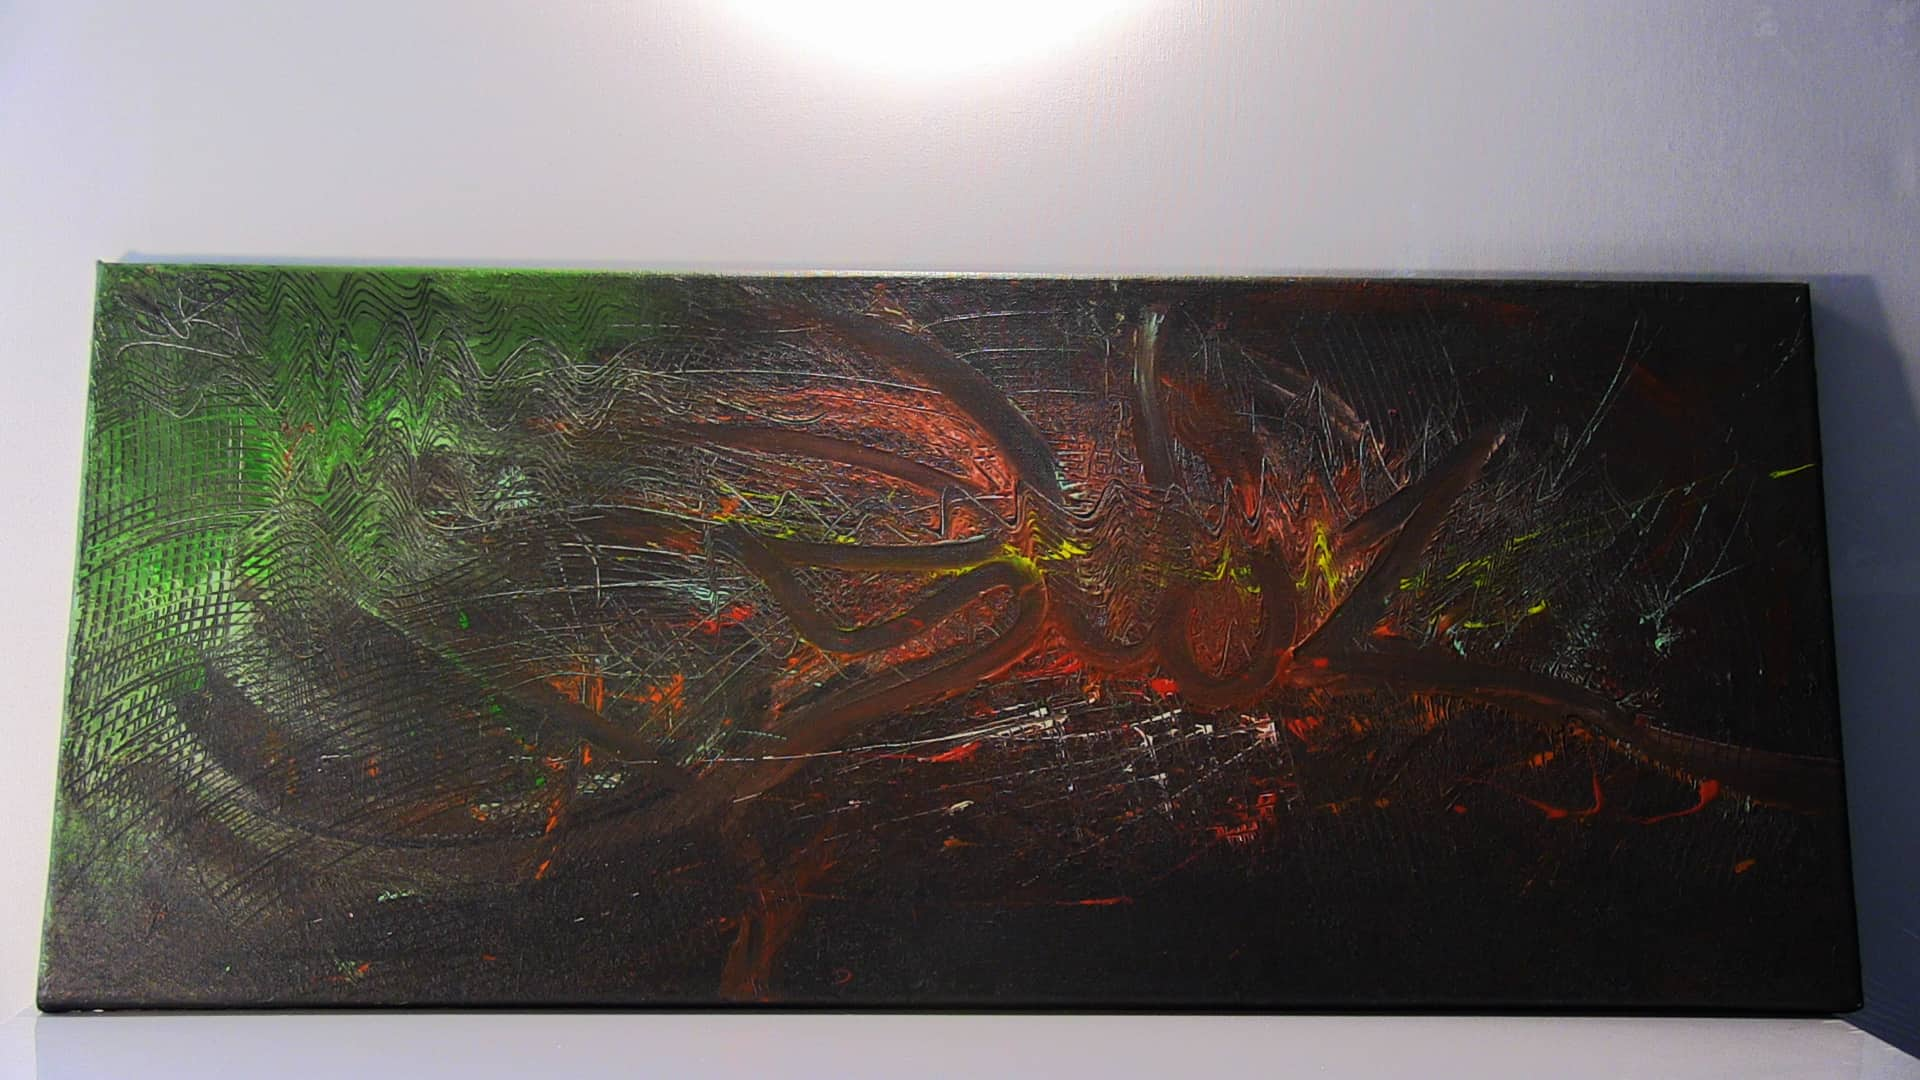 tableau toile suoz artiste wordlwide wild style custom achat tableau artiste graffeur graffiti cote paris la rochelle new yord